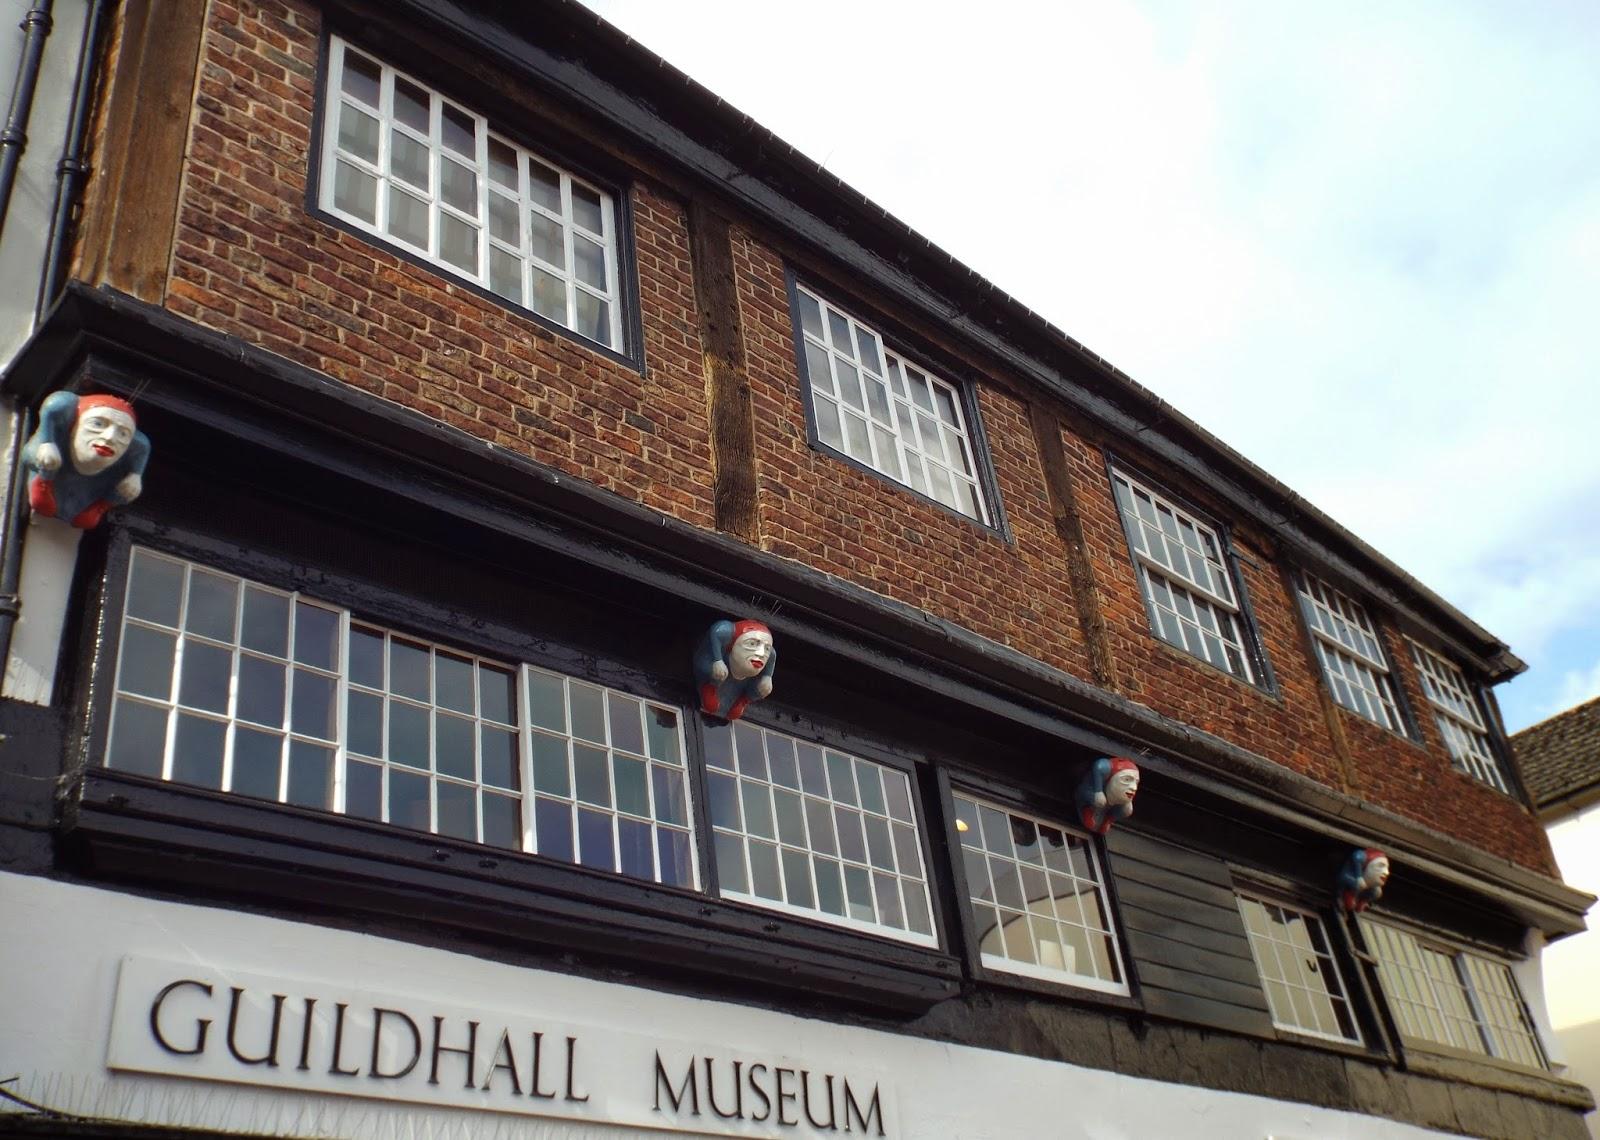 Carlisle Guildhall Museum